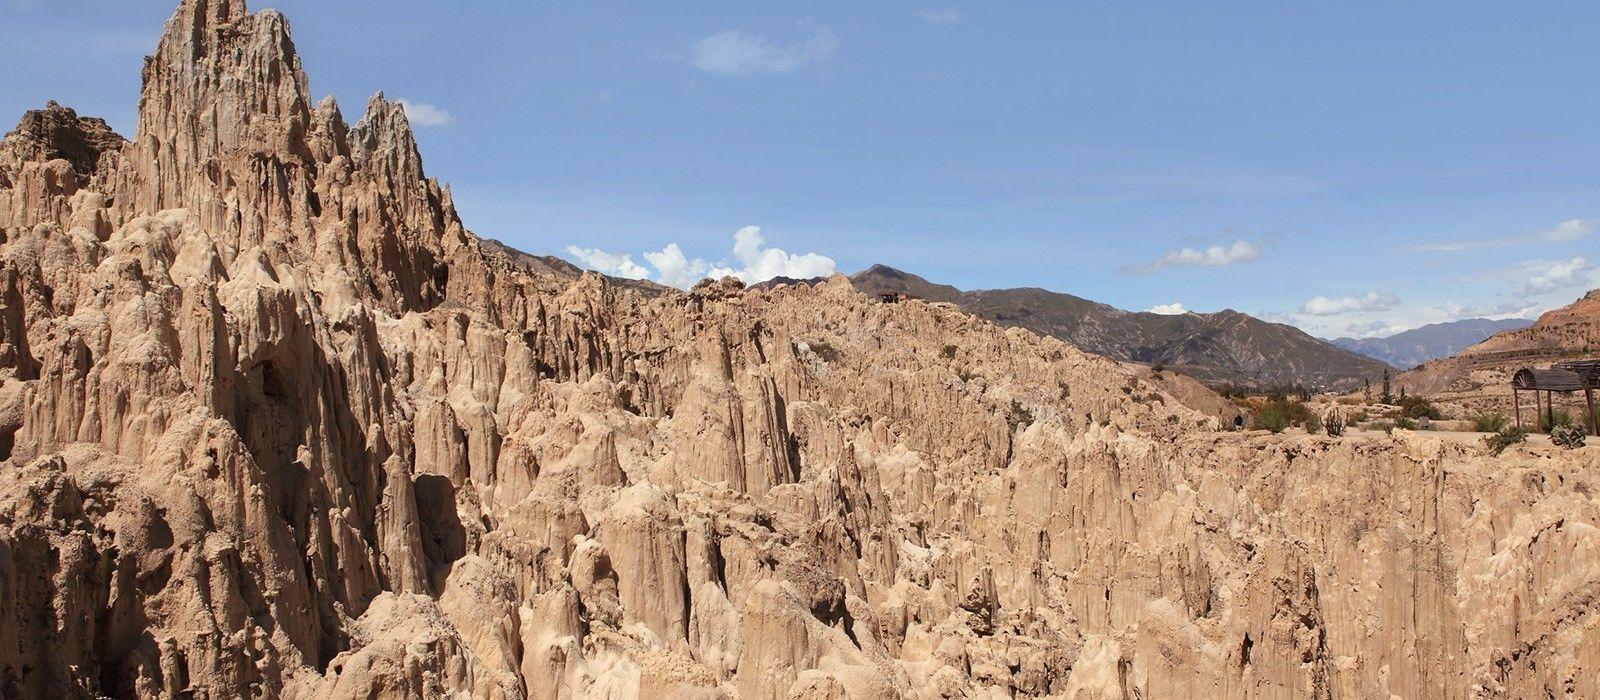 Destination La Paz Bolivia